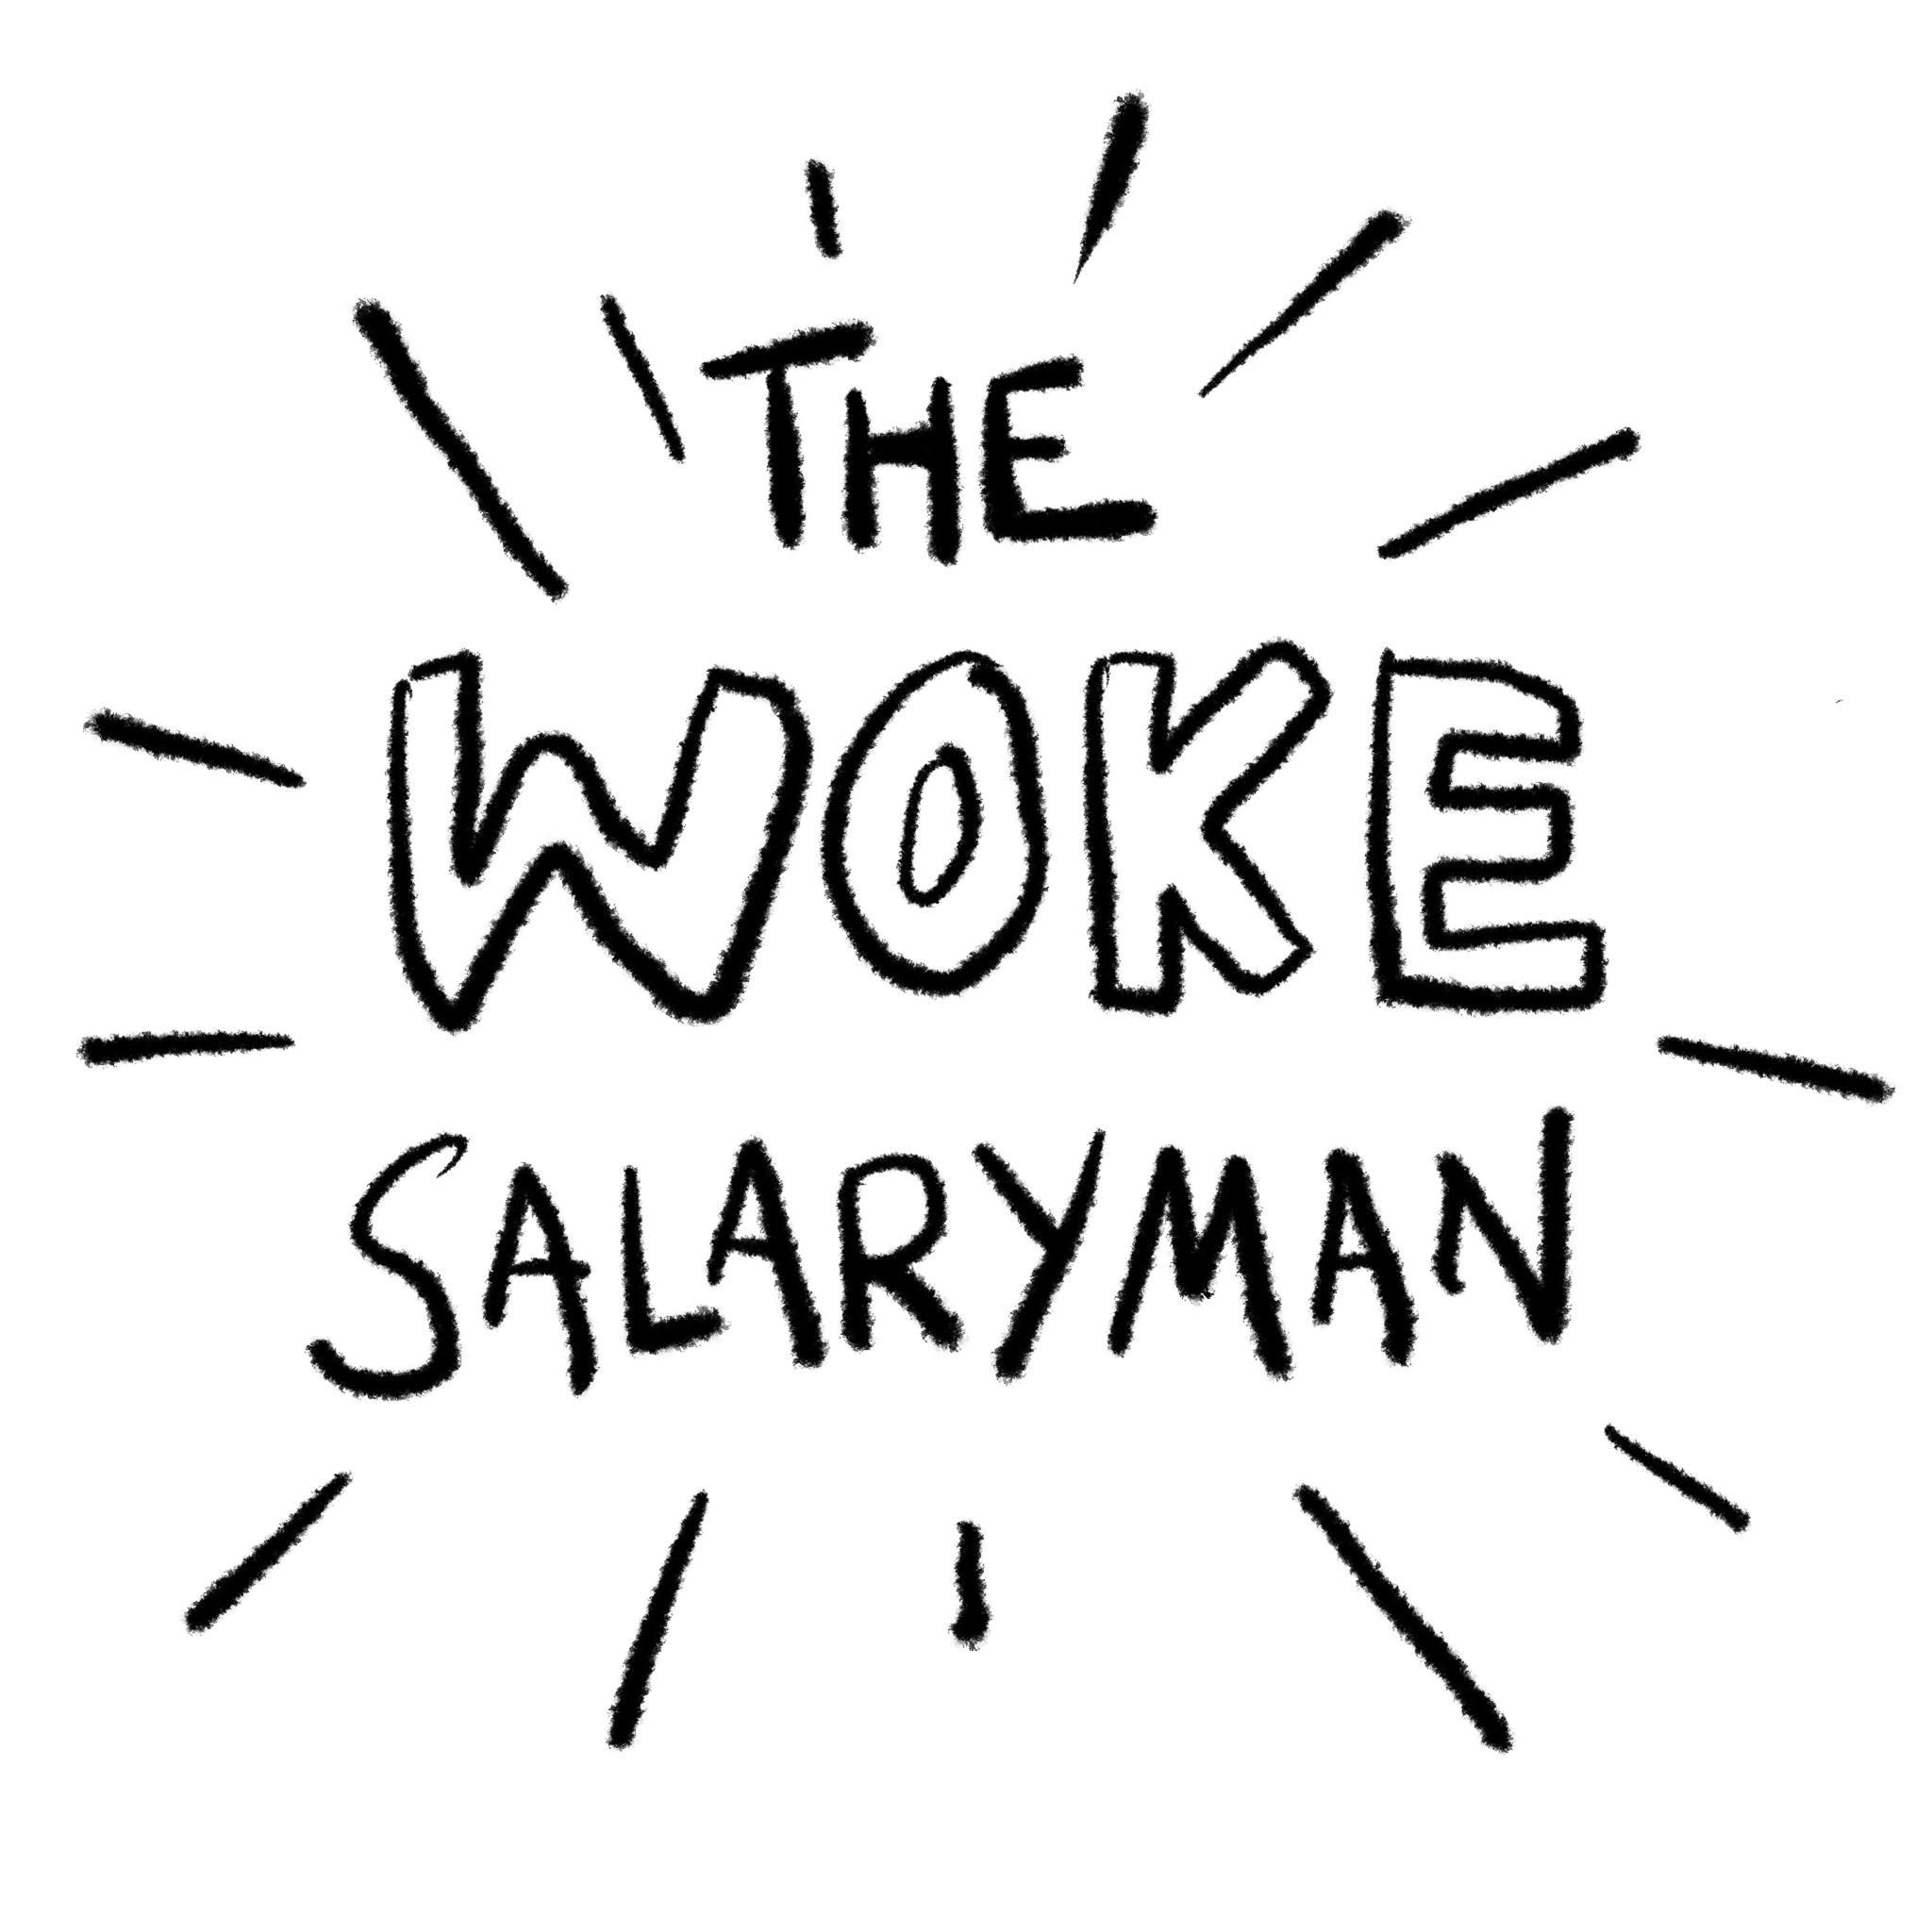 The Woke Salaryman: - stay woke, salarymen